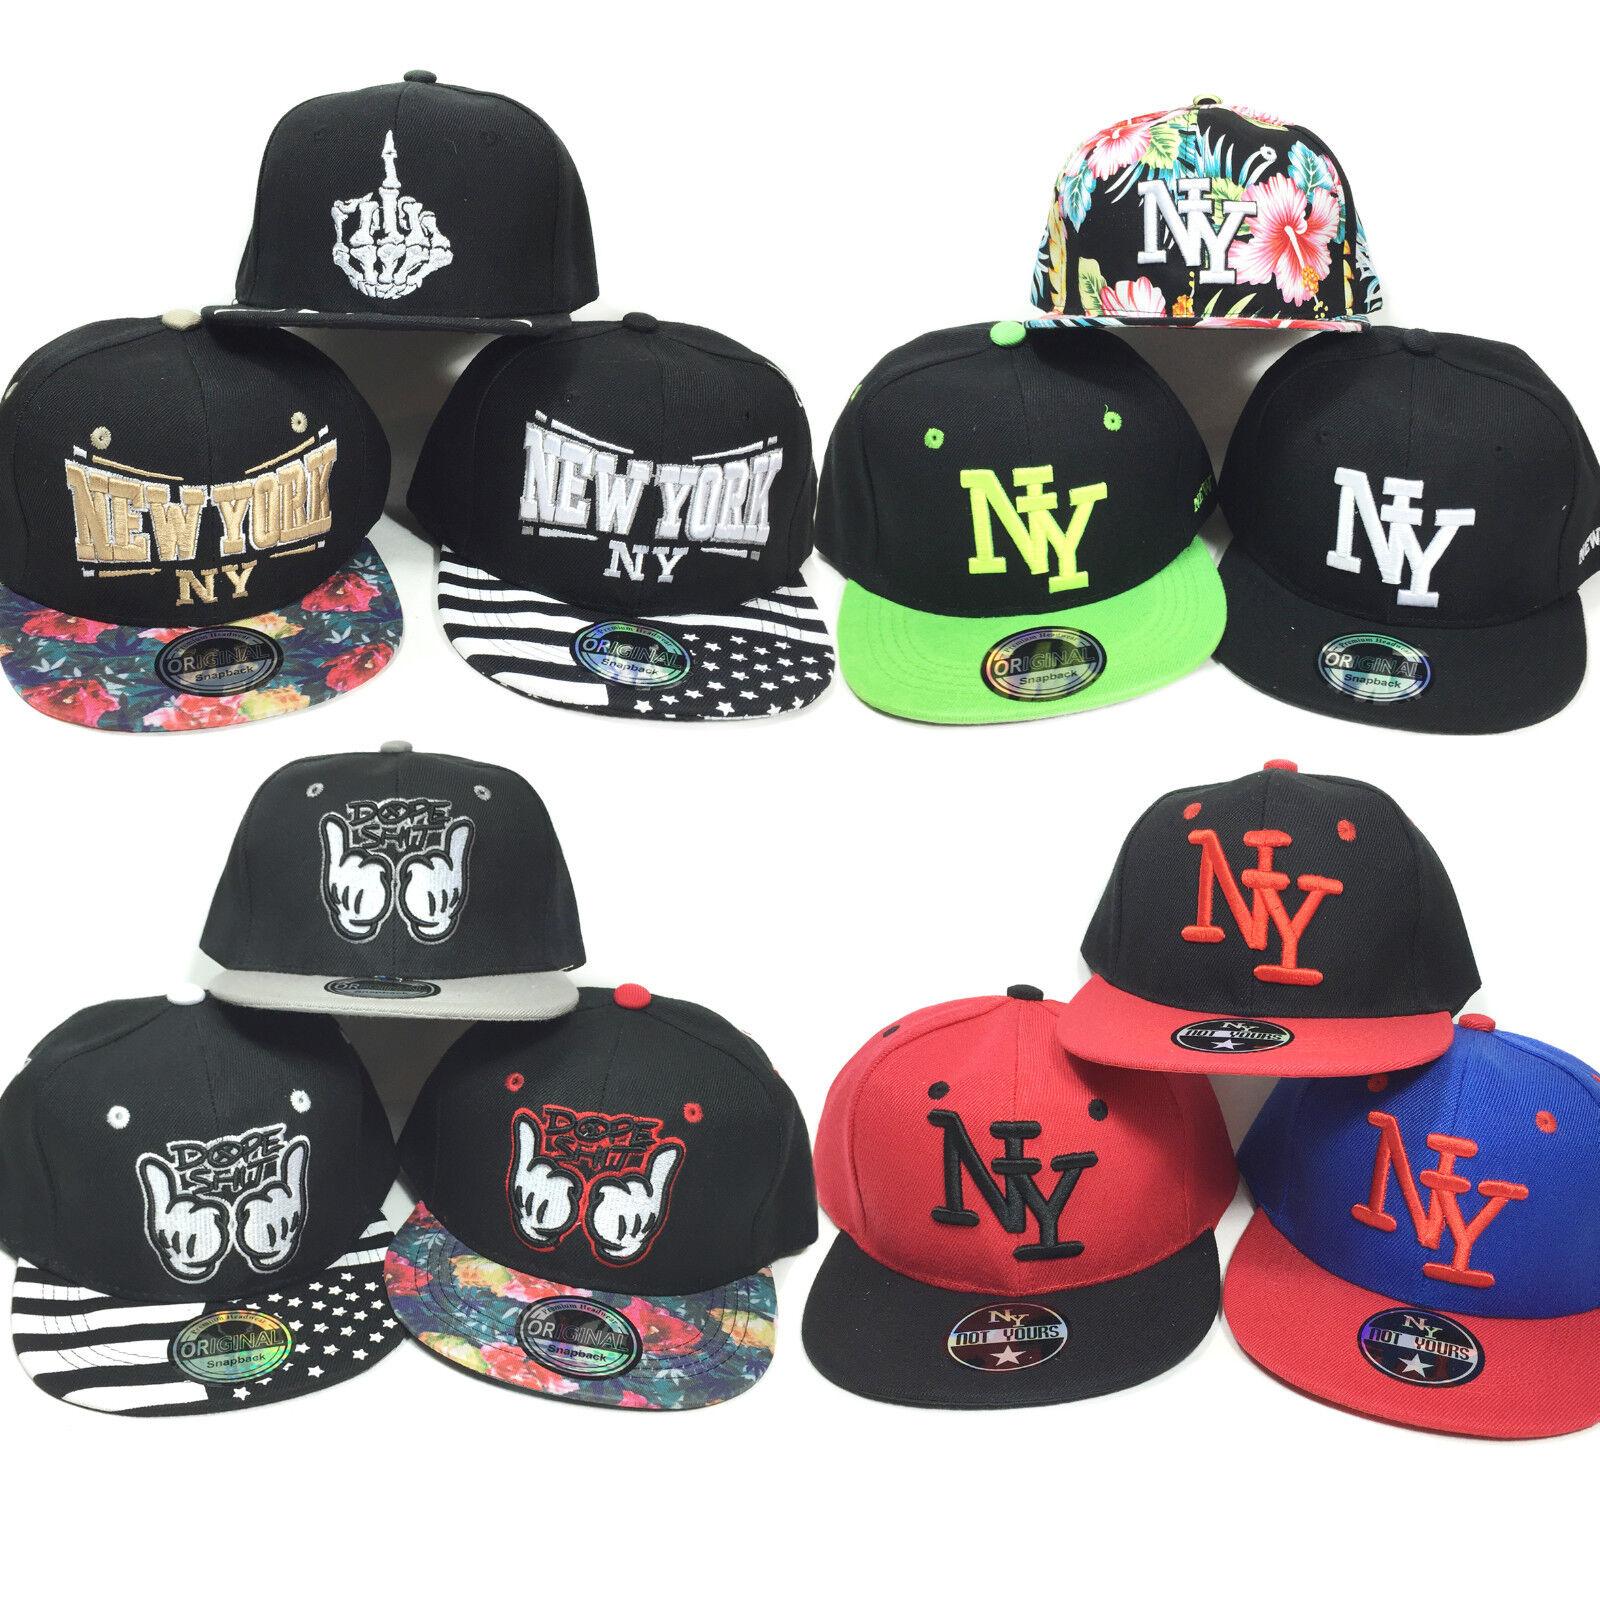 47241dbf8bae6b finest kinder cap snapback basecap caps kappe baseball mtze unisex new york  new with basecap kinder